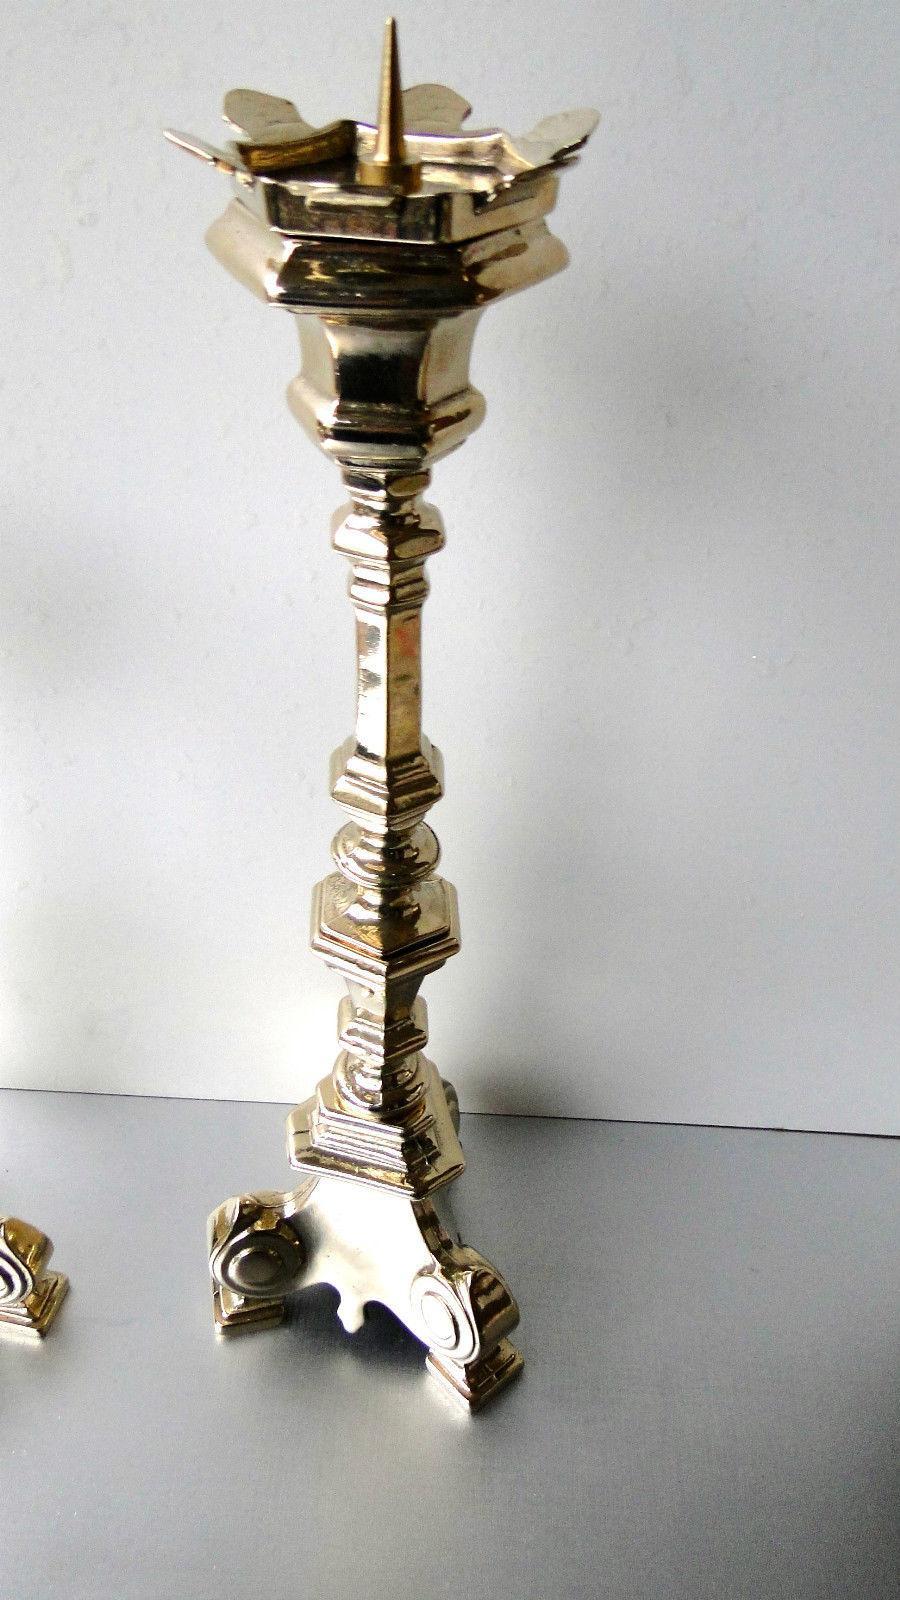 messing kerzenst nder altar kirchenleuchter kandelaber antik gold 30 cm hoch kaufen bei. Black Bedroom Furniture Sets. Home Design Ideas